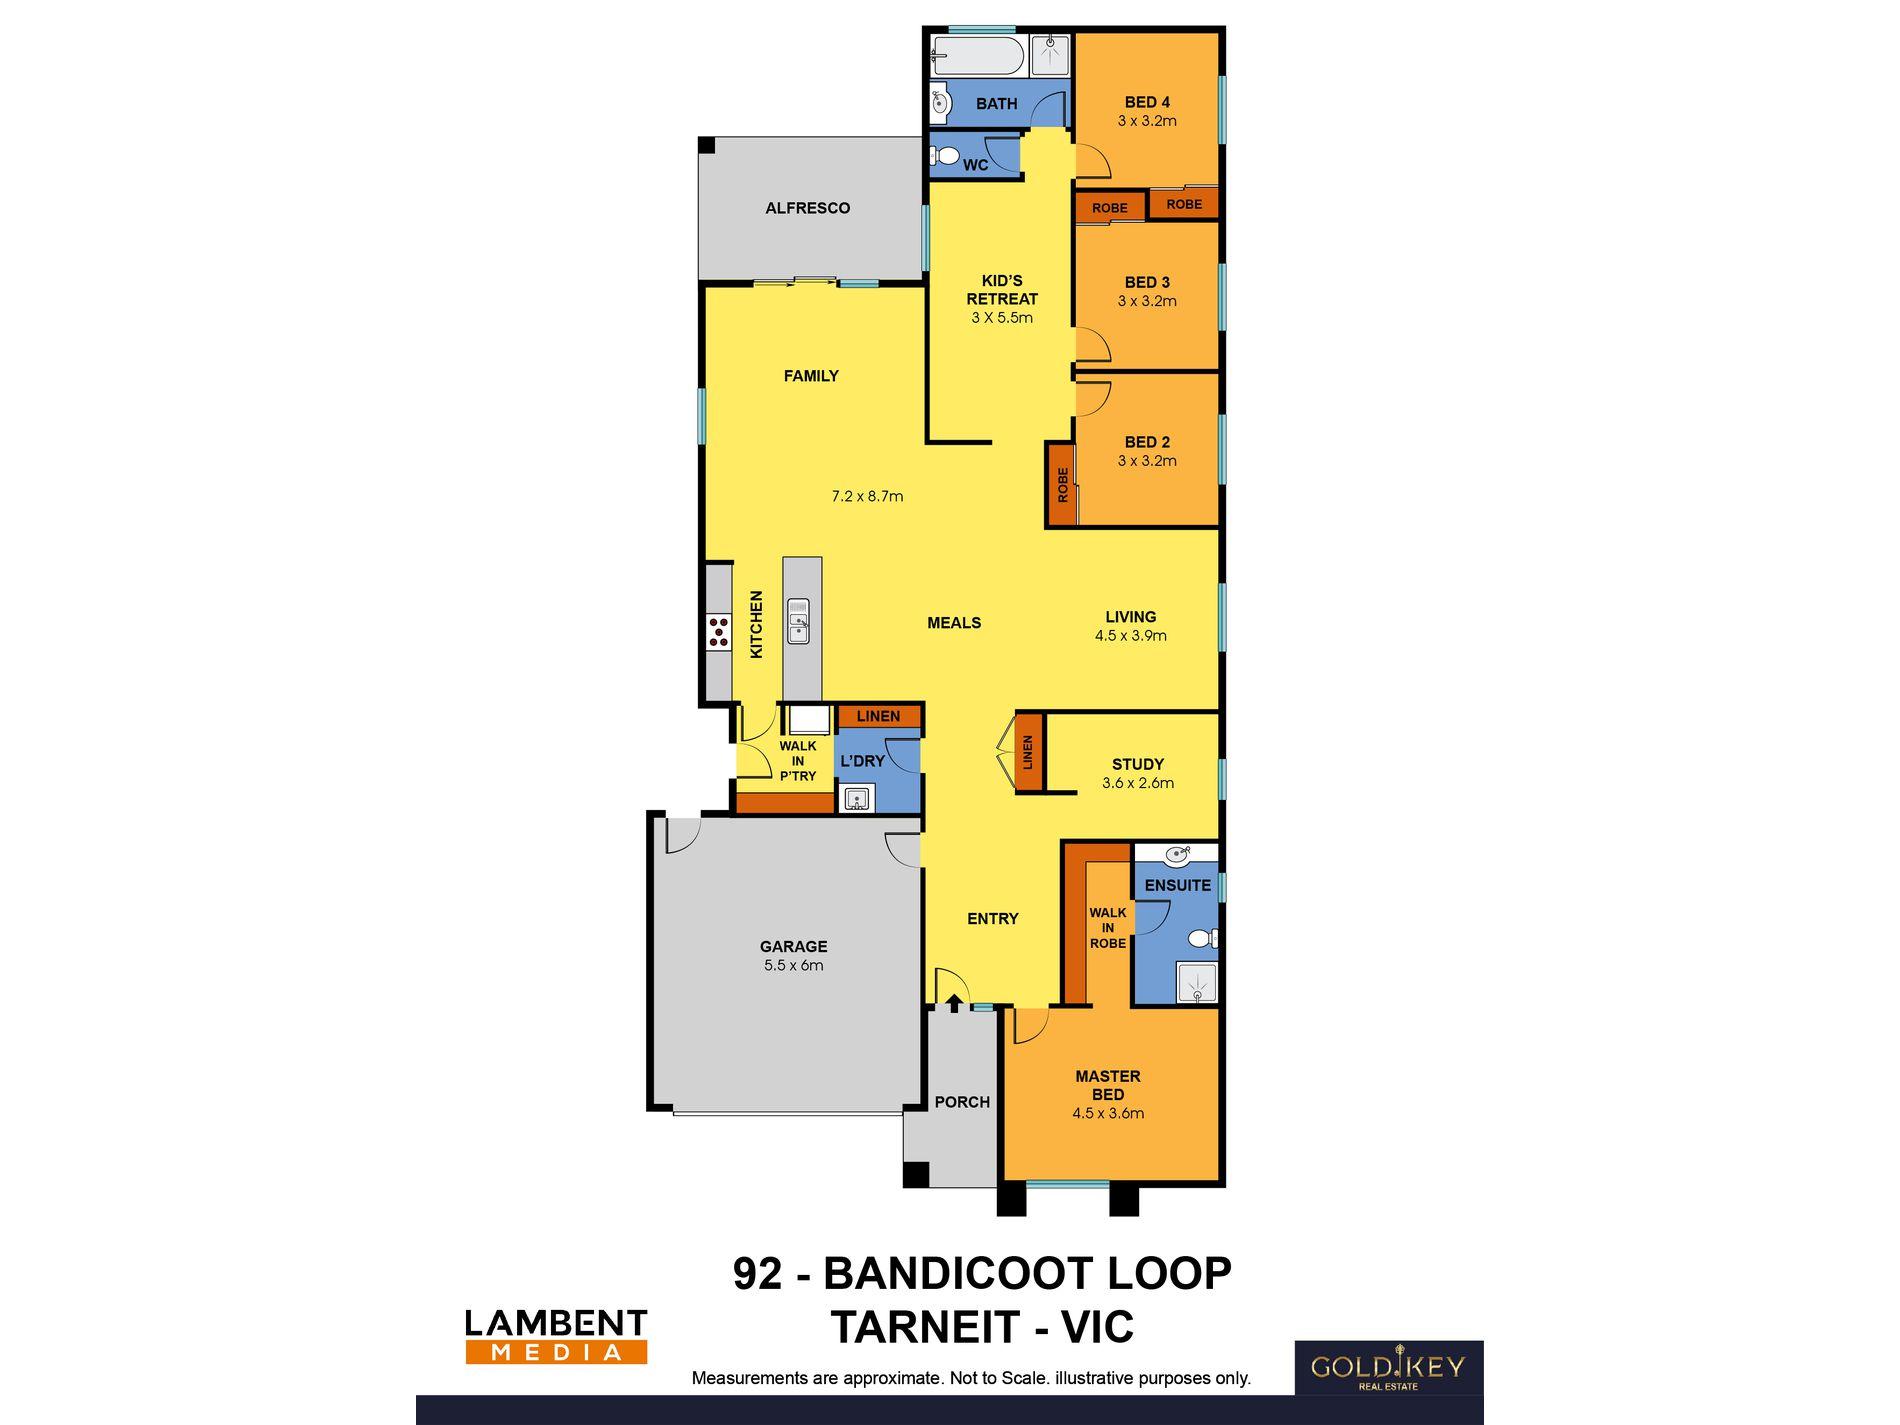 92 Bandicoot Loop, Tarneit